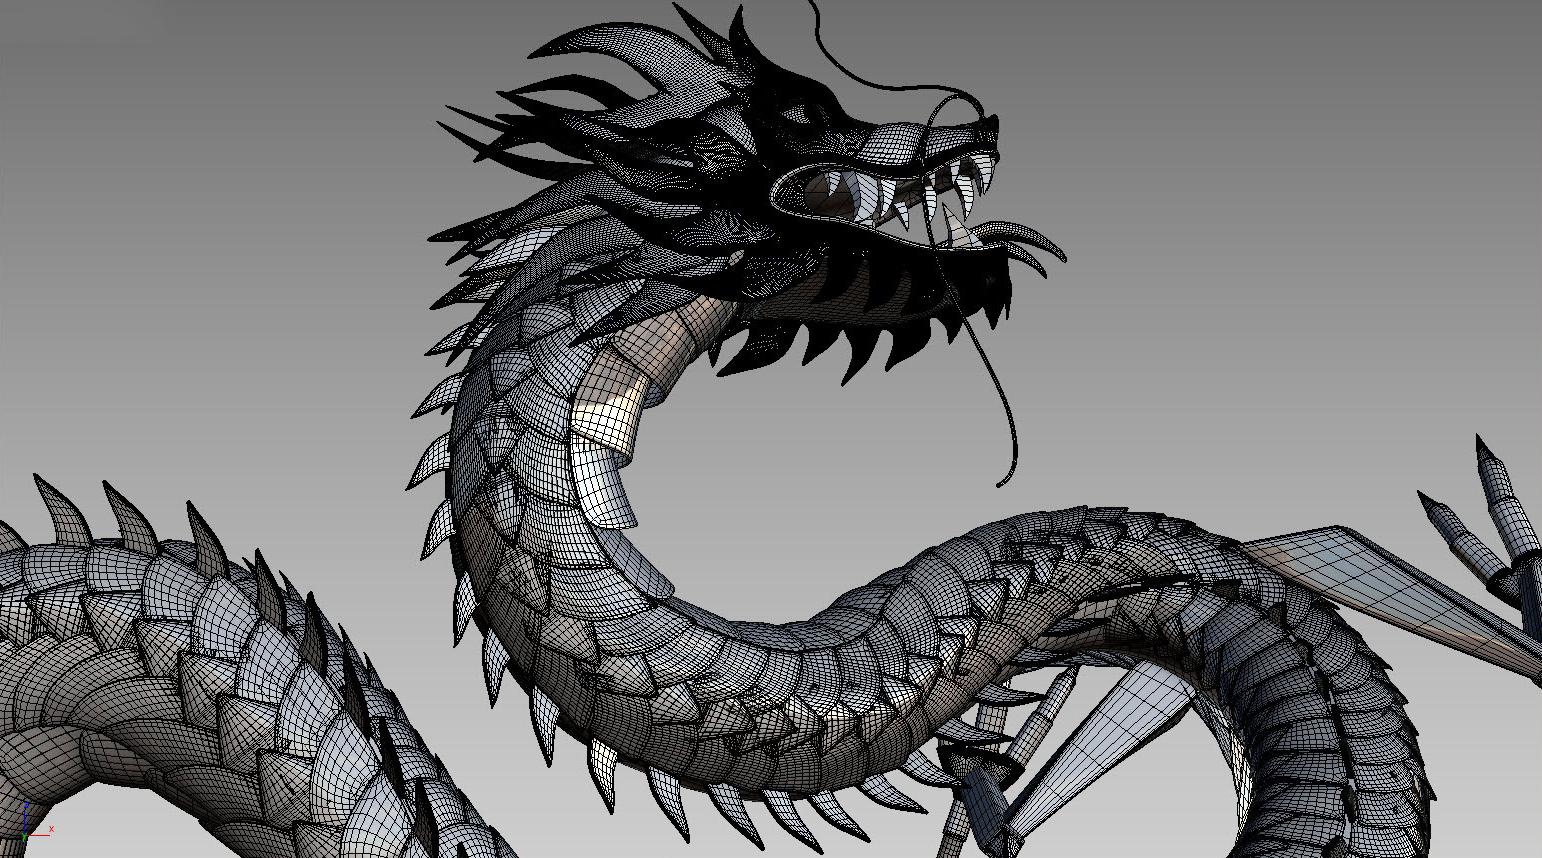 rong 3d - 3d dragon-bratus-designer vietnam